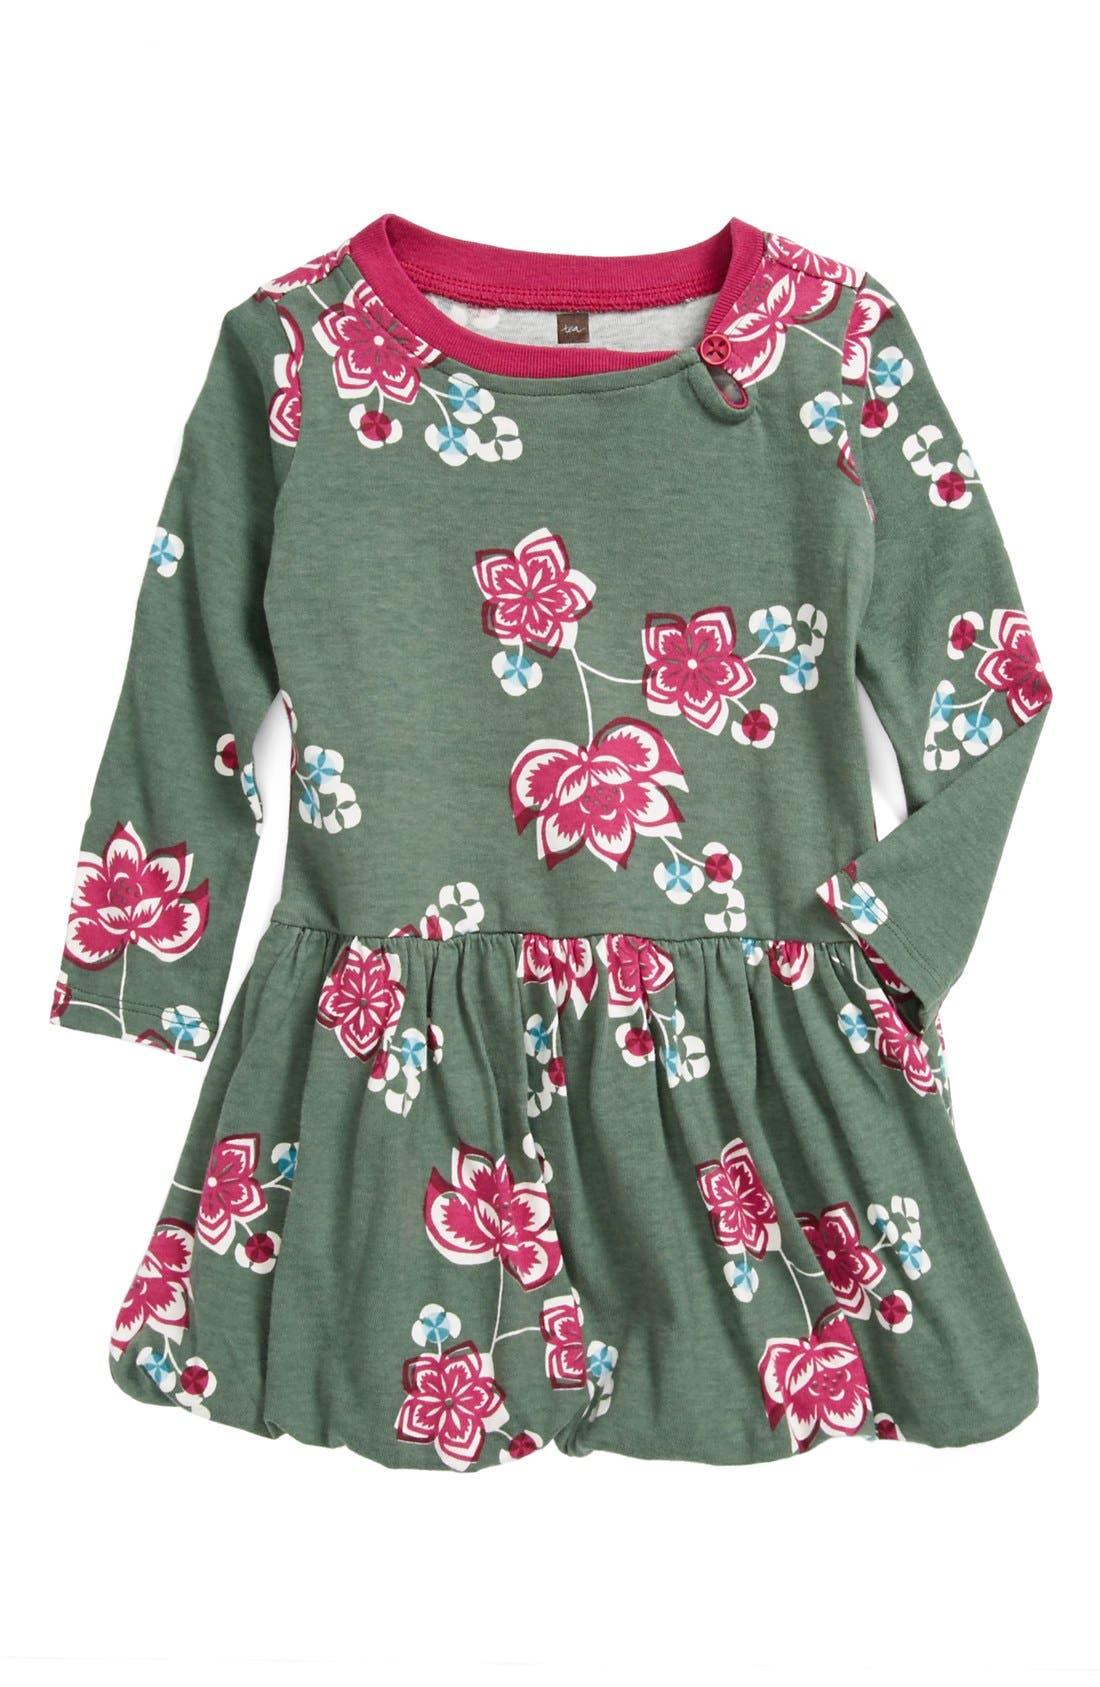 Alternate Image 1 Selected - Tea Collection 'Jianzhi' Bubble Dress (Baby Girls)